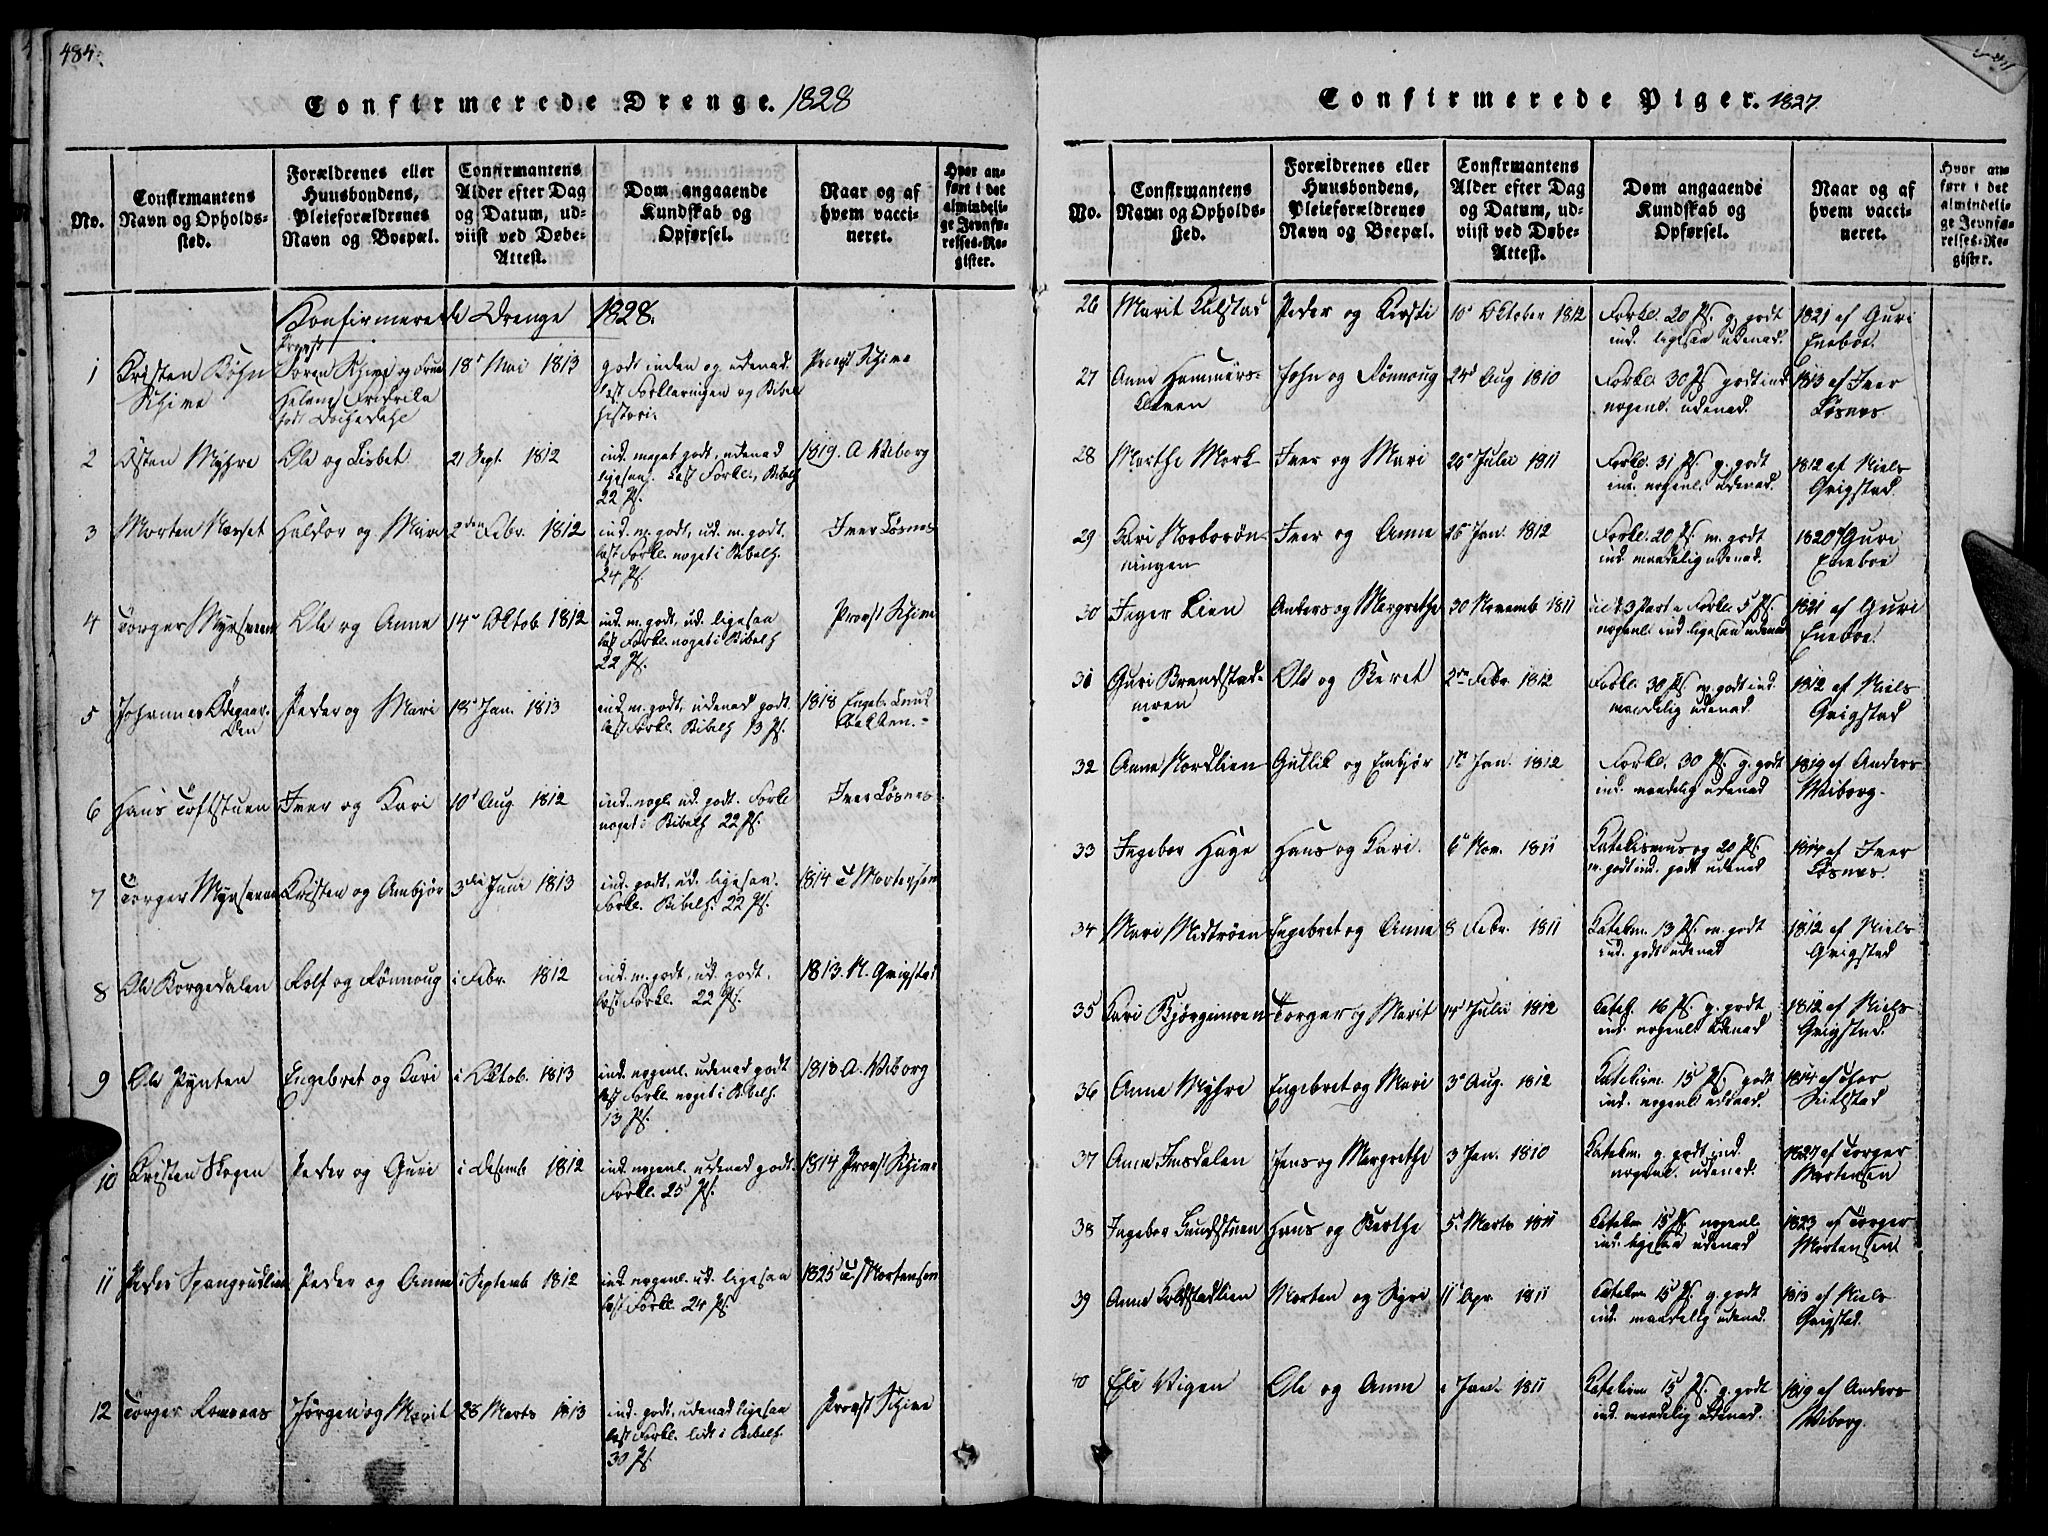 SAH, Ringebu prestekontor, Ministerialbok nr. 4, 1821-1839, s. 484-485